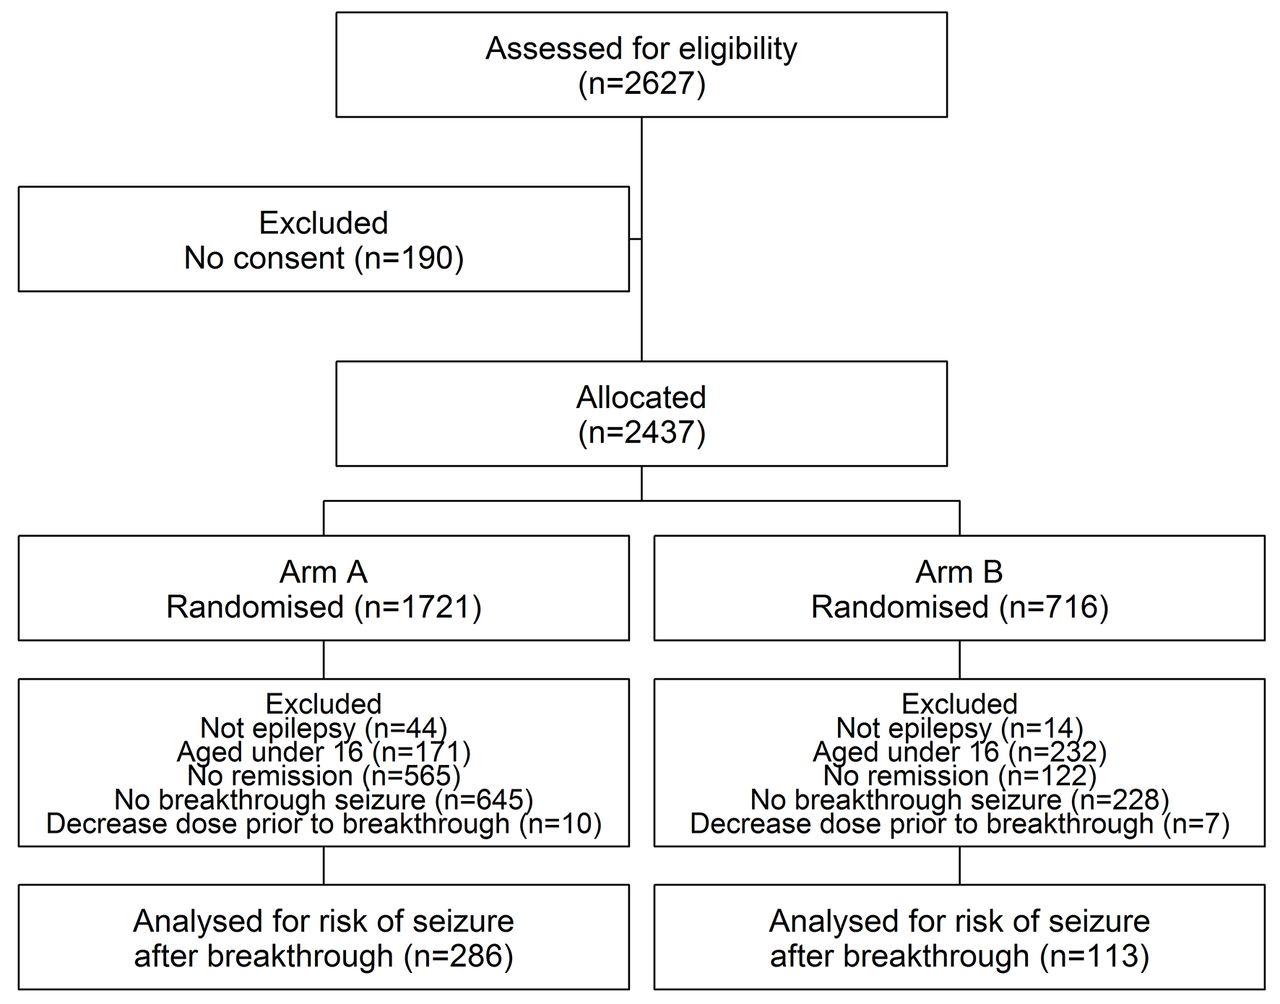 Risk of a seizure recurrence after a breakthrough seizure